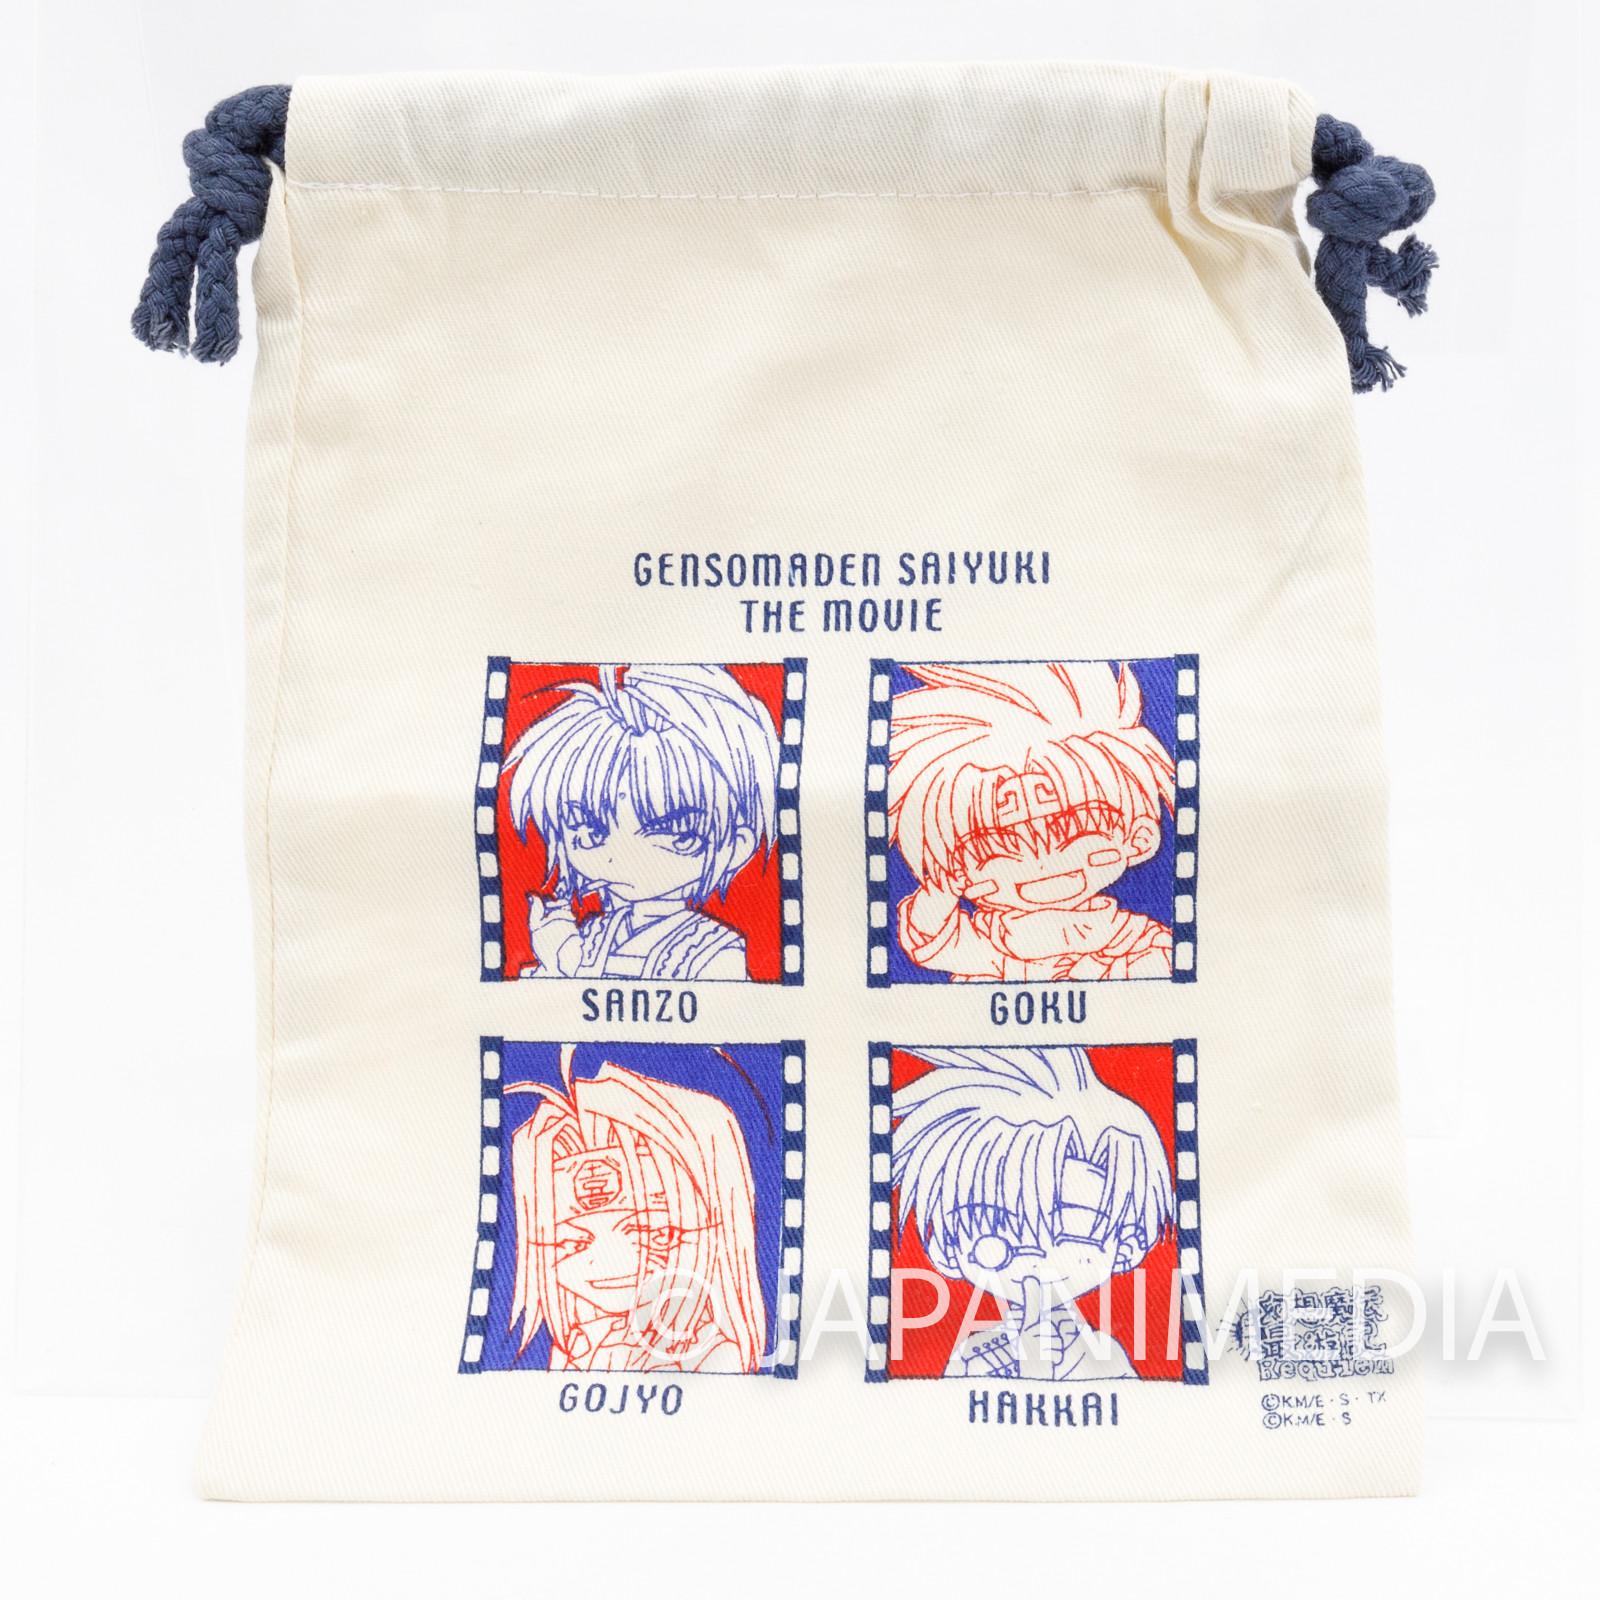 Gensomaden SAIYUKI Requiem Drawstring Bag Kazuya Minekura JAPAN ANIME